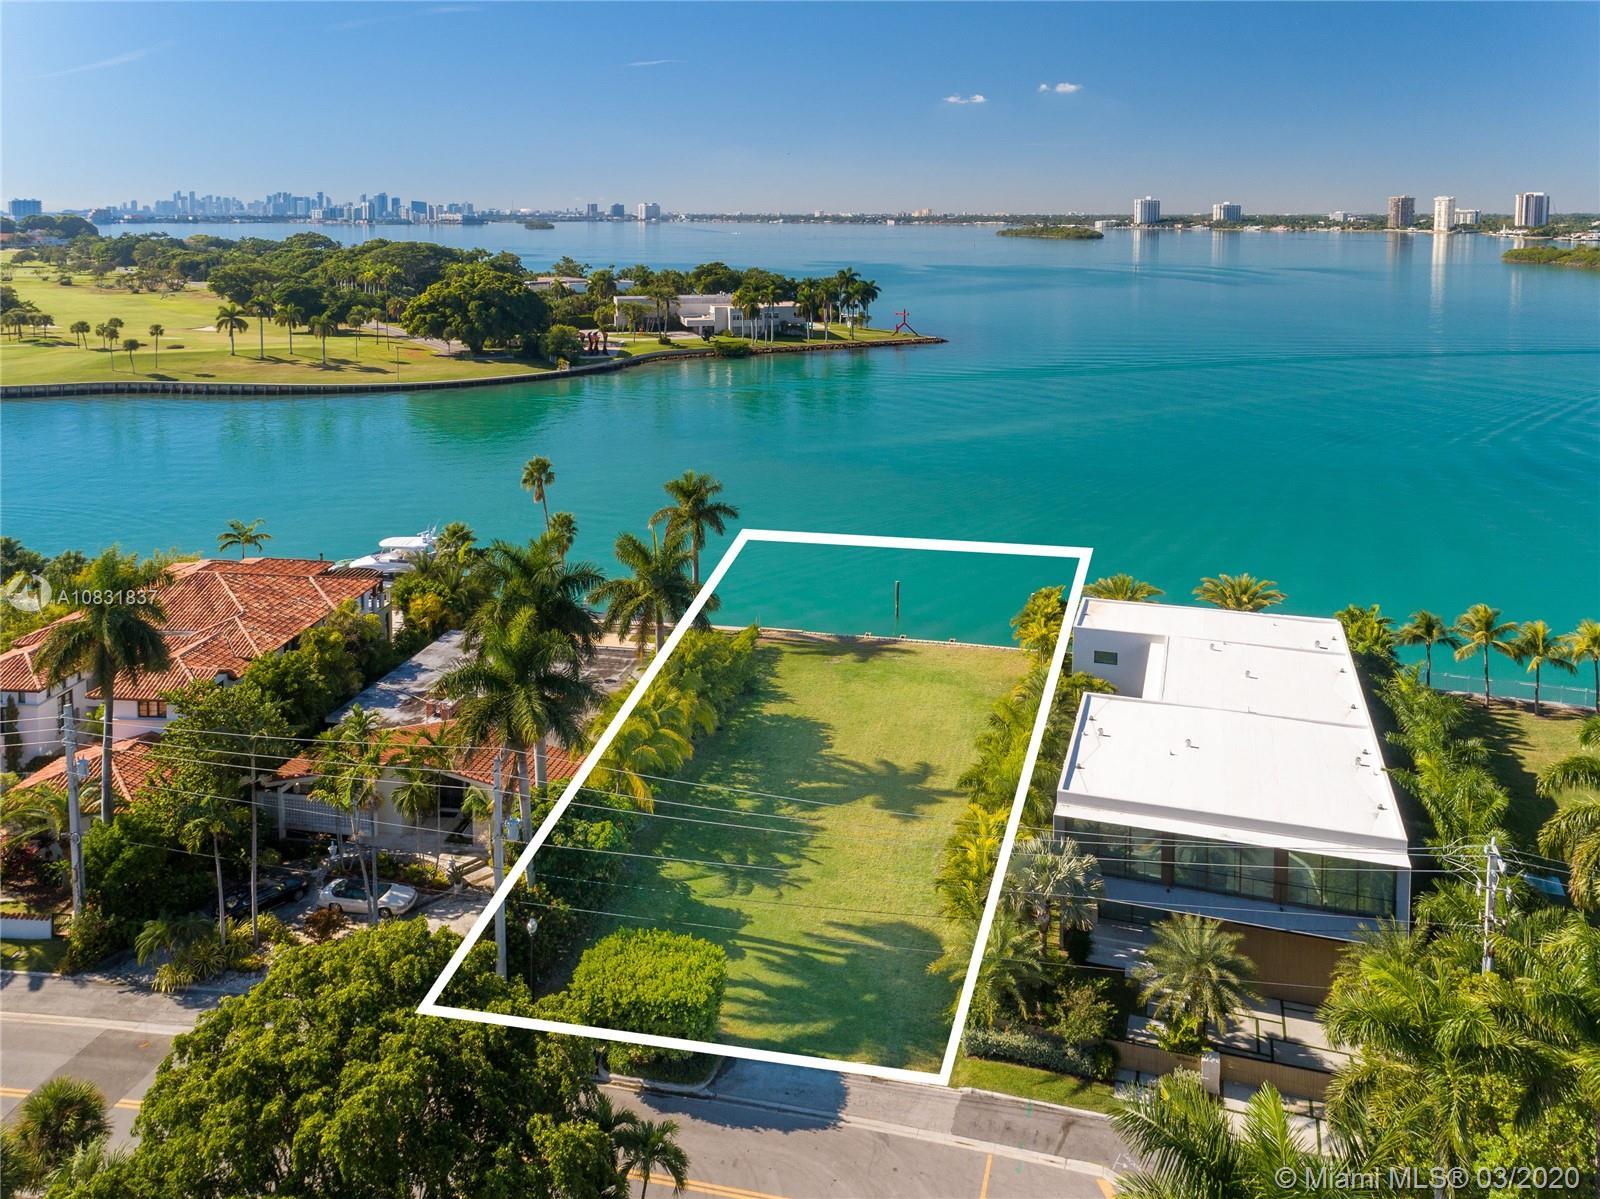 9530 W Broadview Dr, Bay Harbor Islands, FL 33154 - Bay Harbor Islands, FL real estate listing